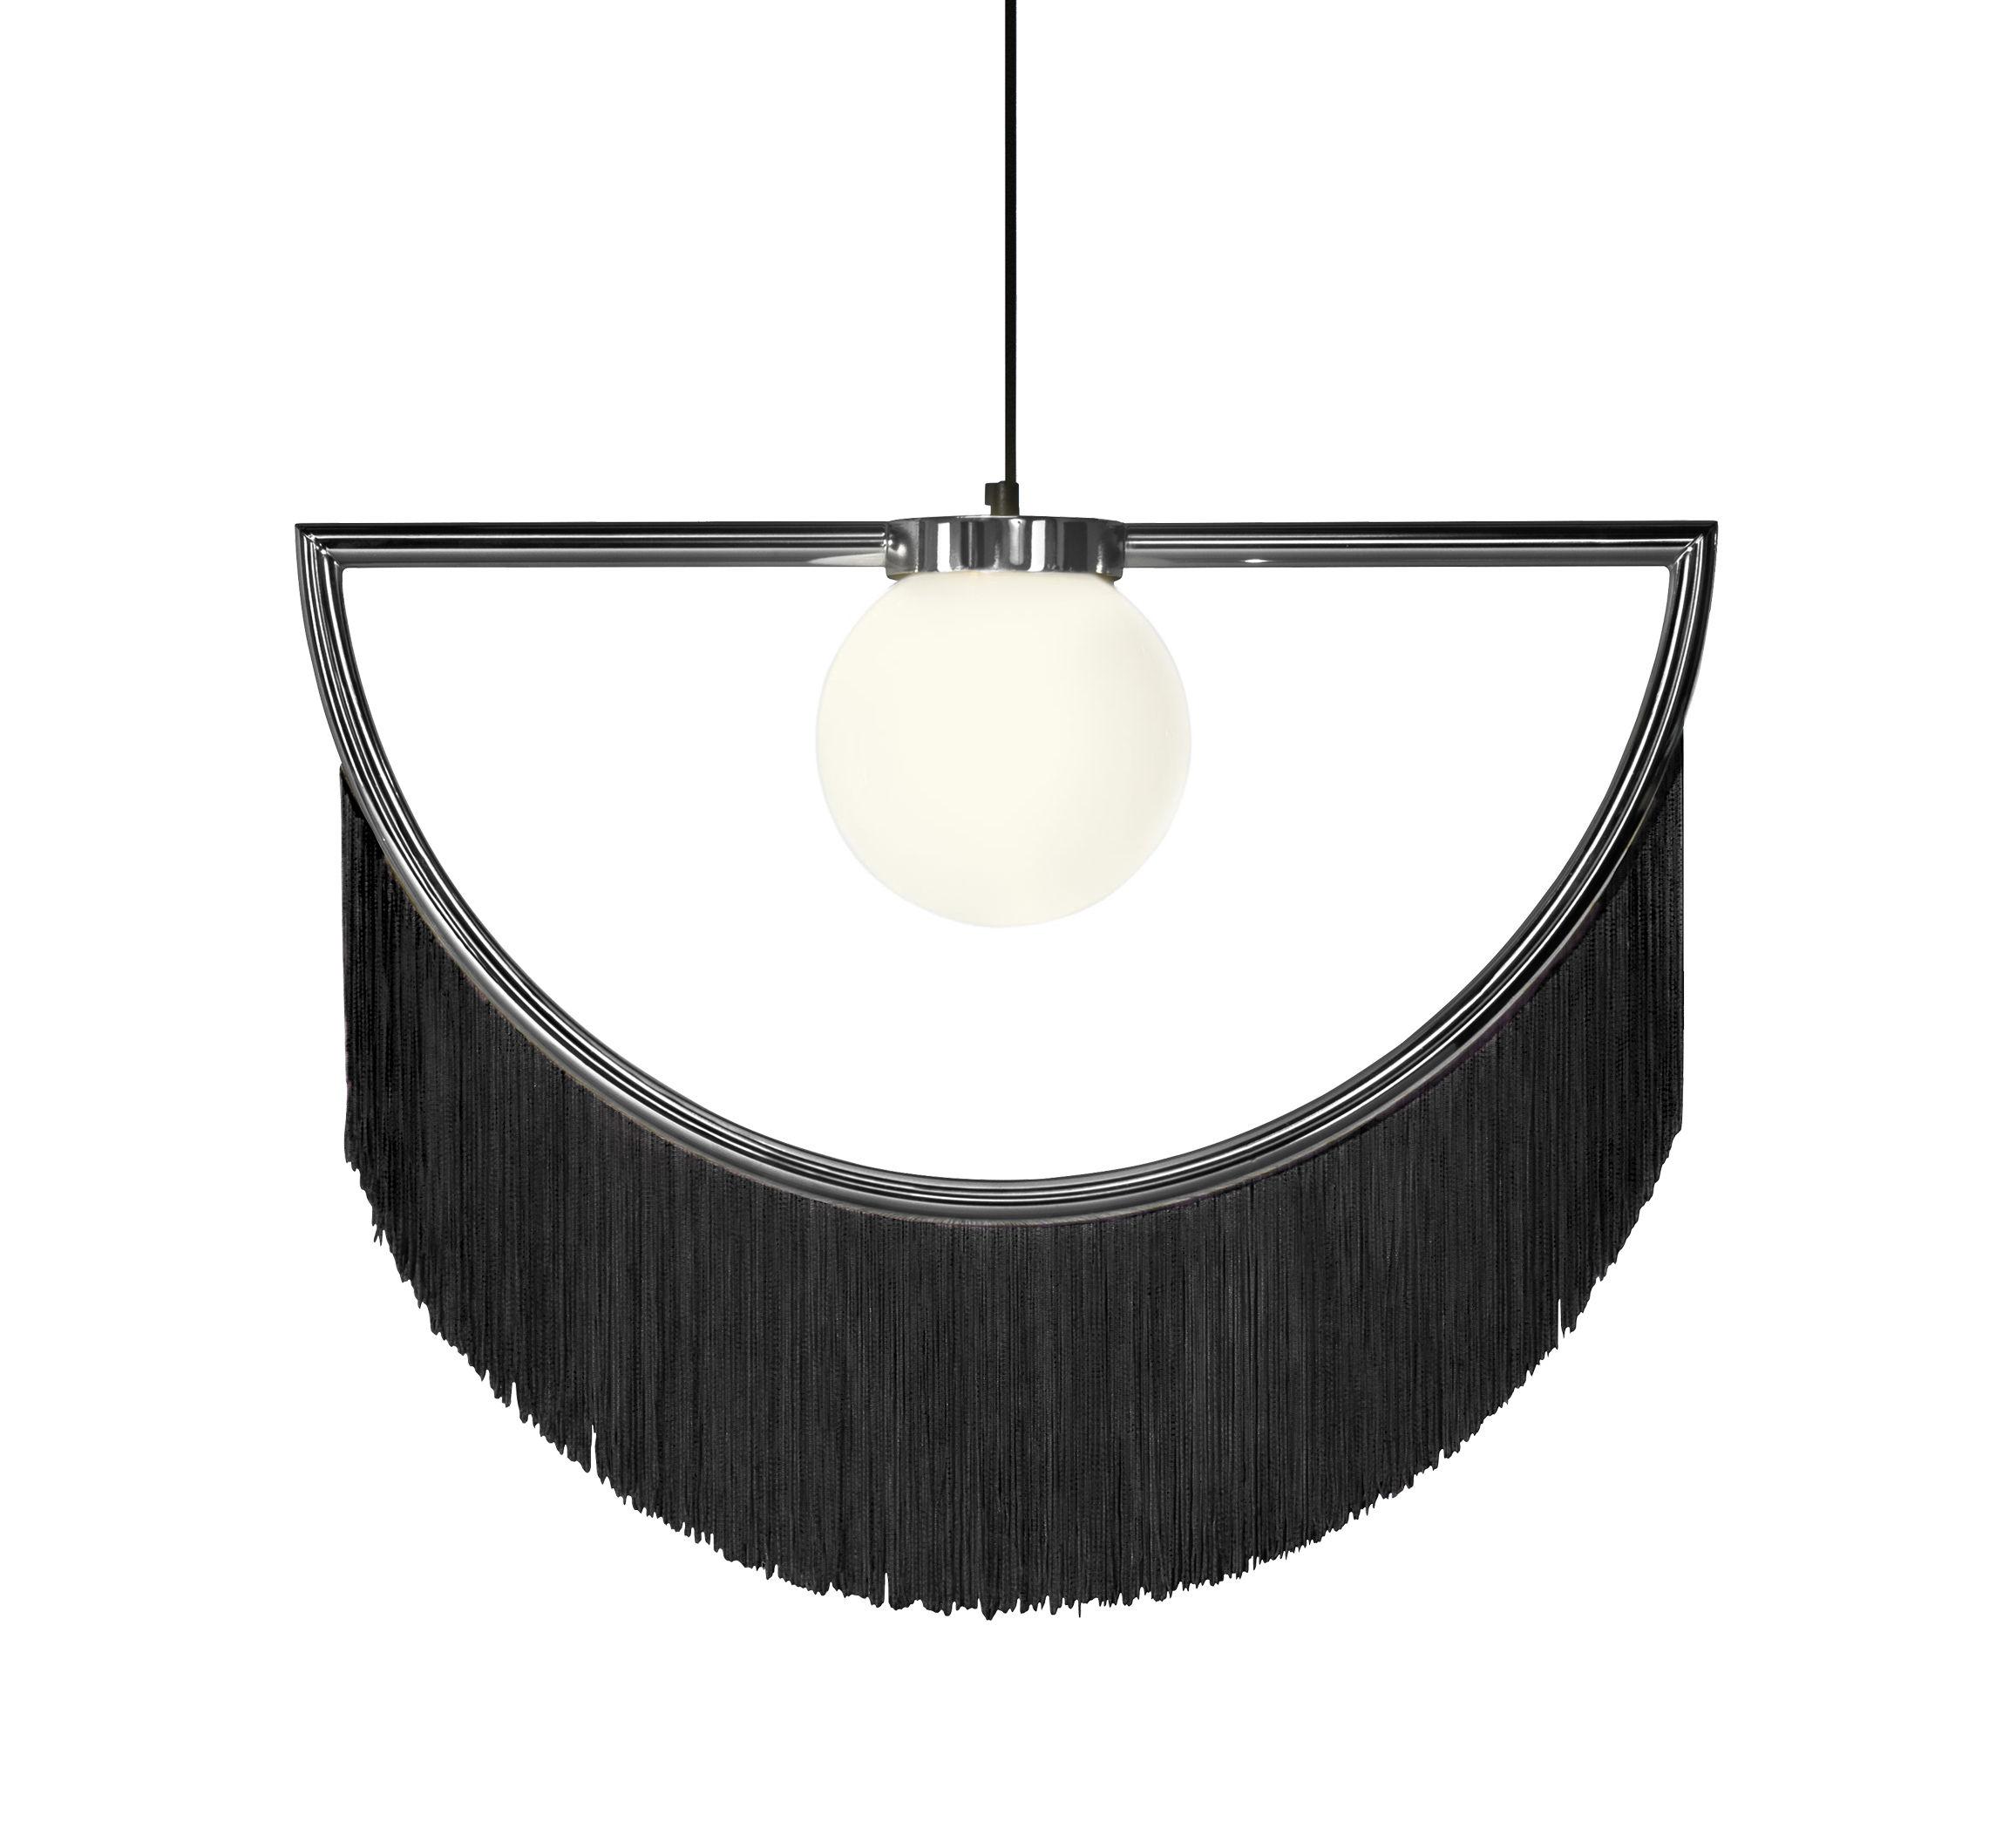 Illuminazione - Lampadari - Sospensione Wink - / Frange - L 60 x H 48 cm di Houtique - Noir / Argent - Acciaio, Acrilico, Vetro opalino